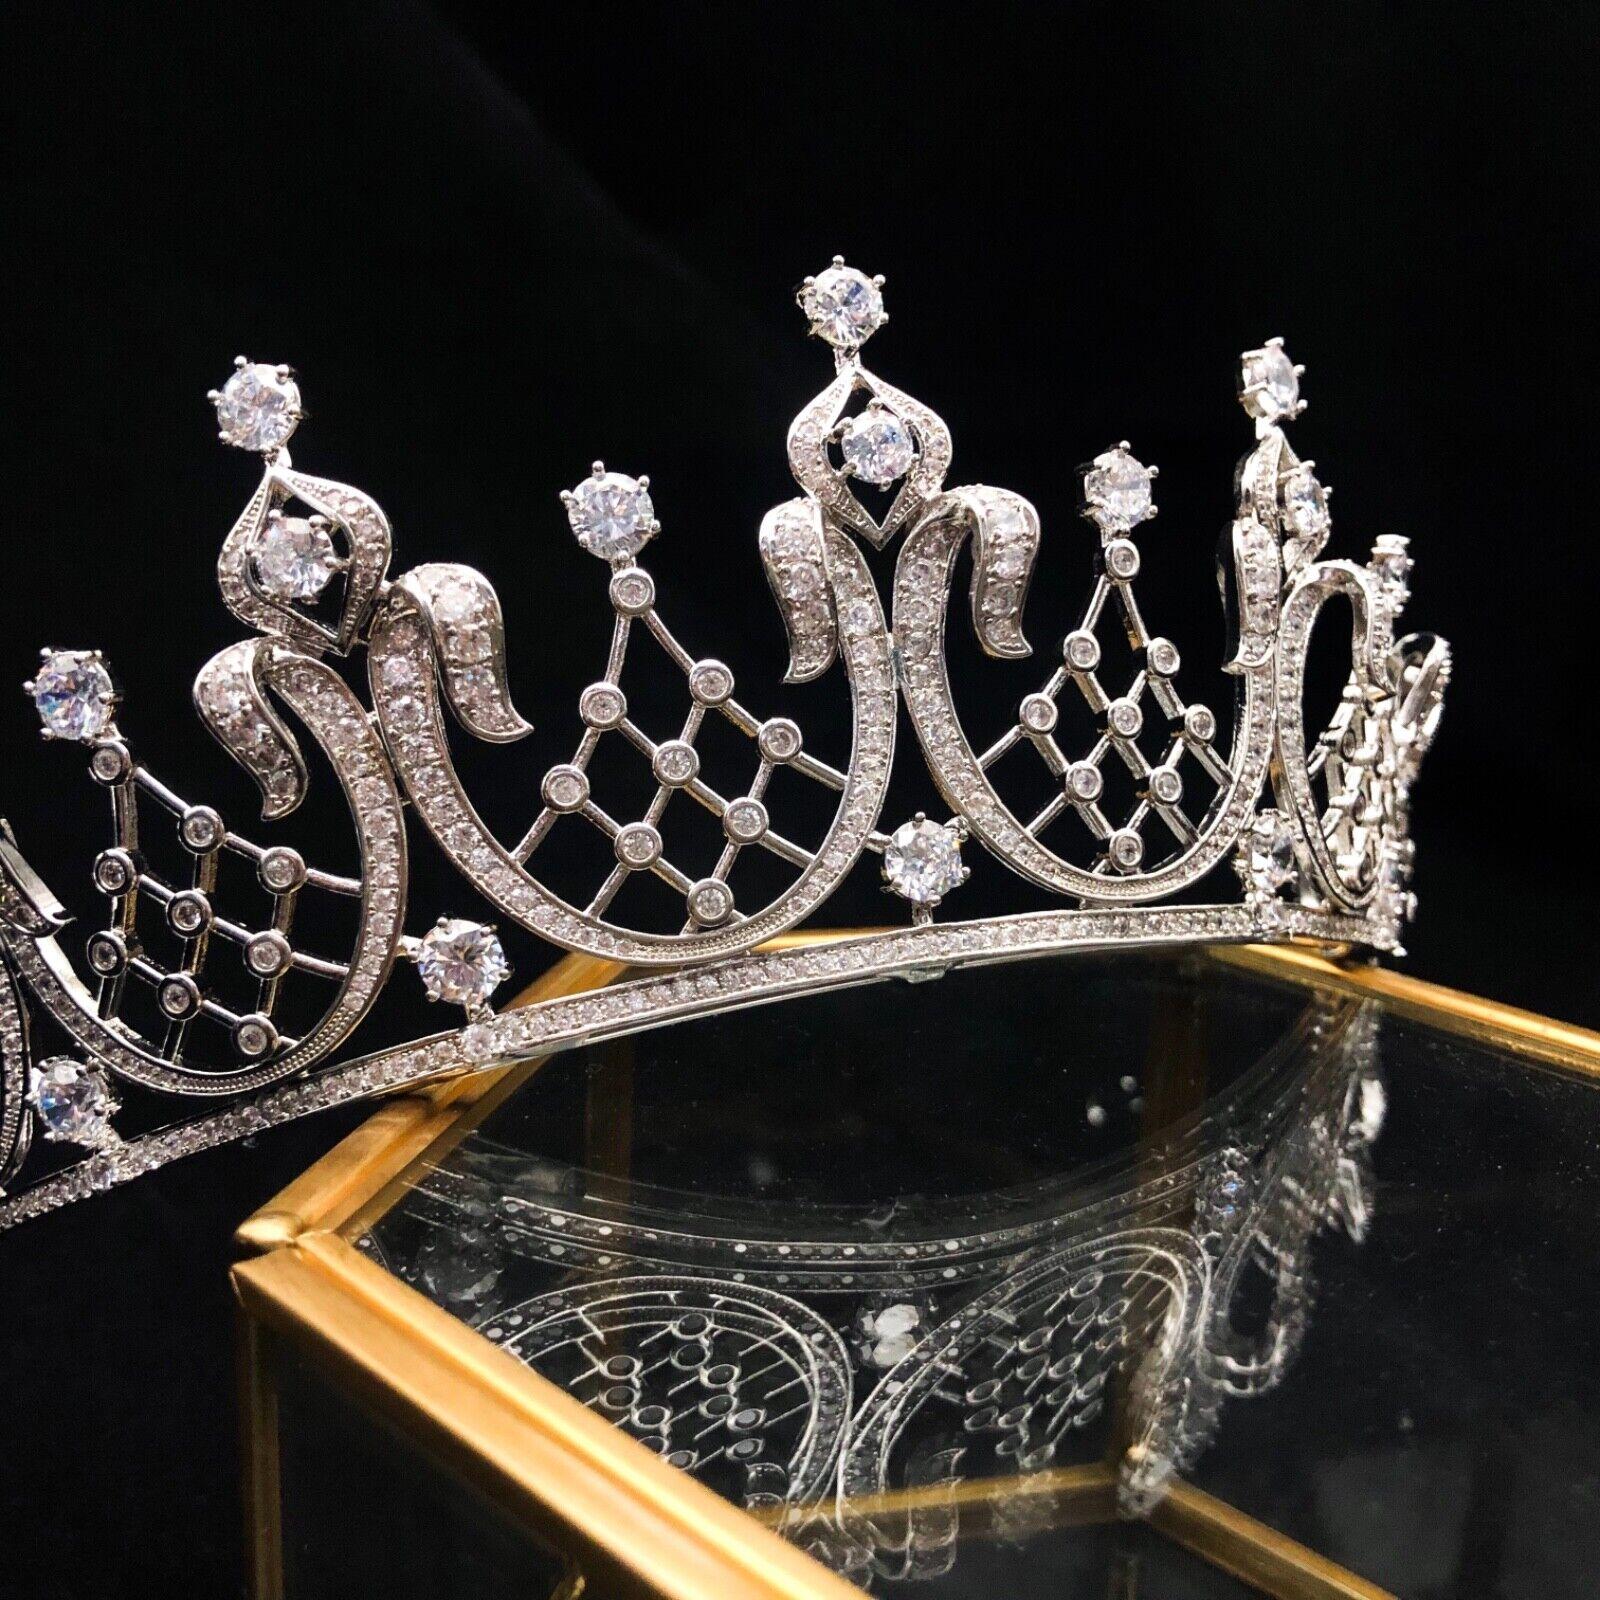 The Elizabeth Schneider, Mike Todd, Luxury CZ Sparkling Artificial Diamond Tiara